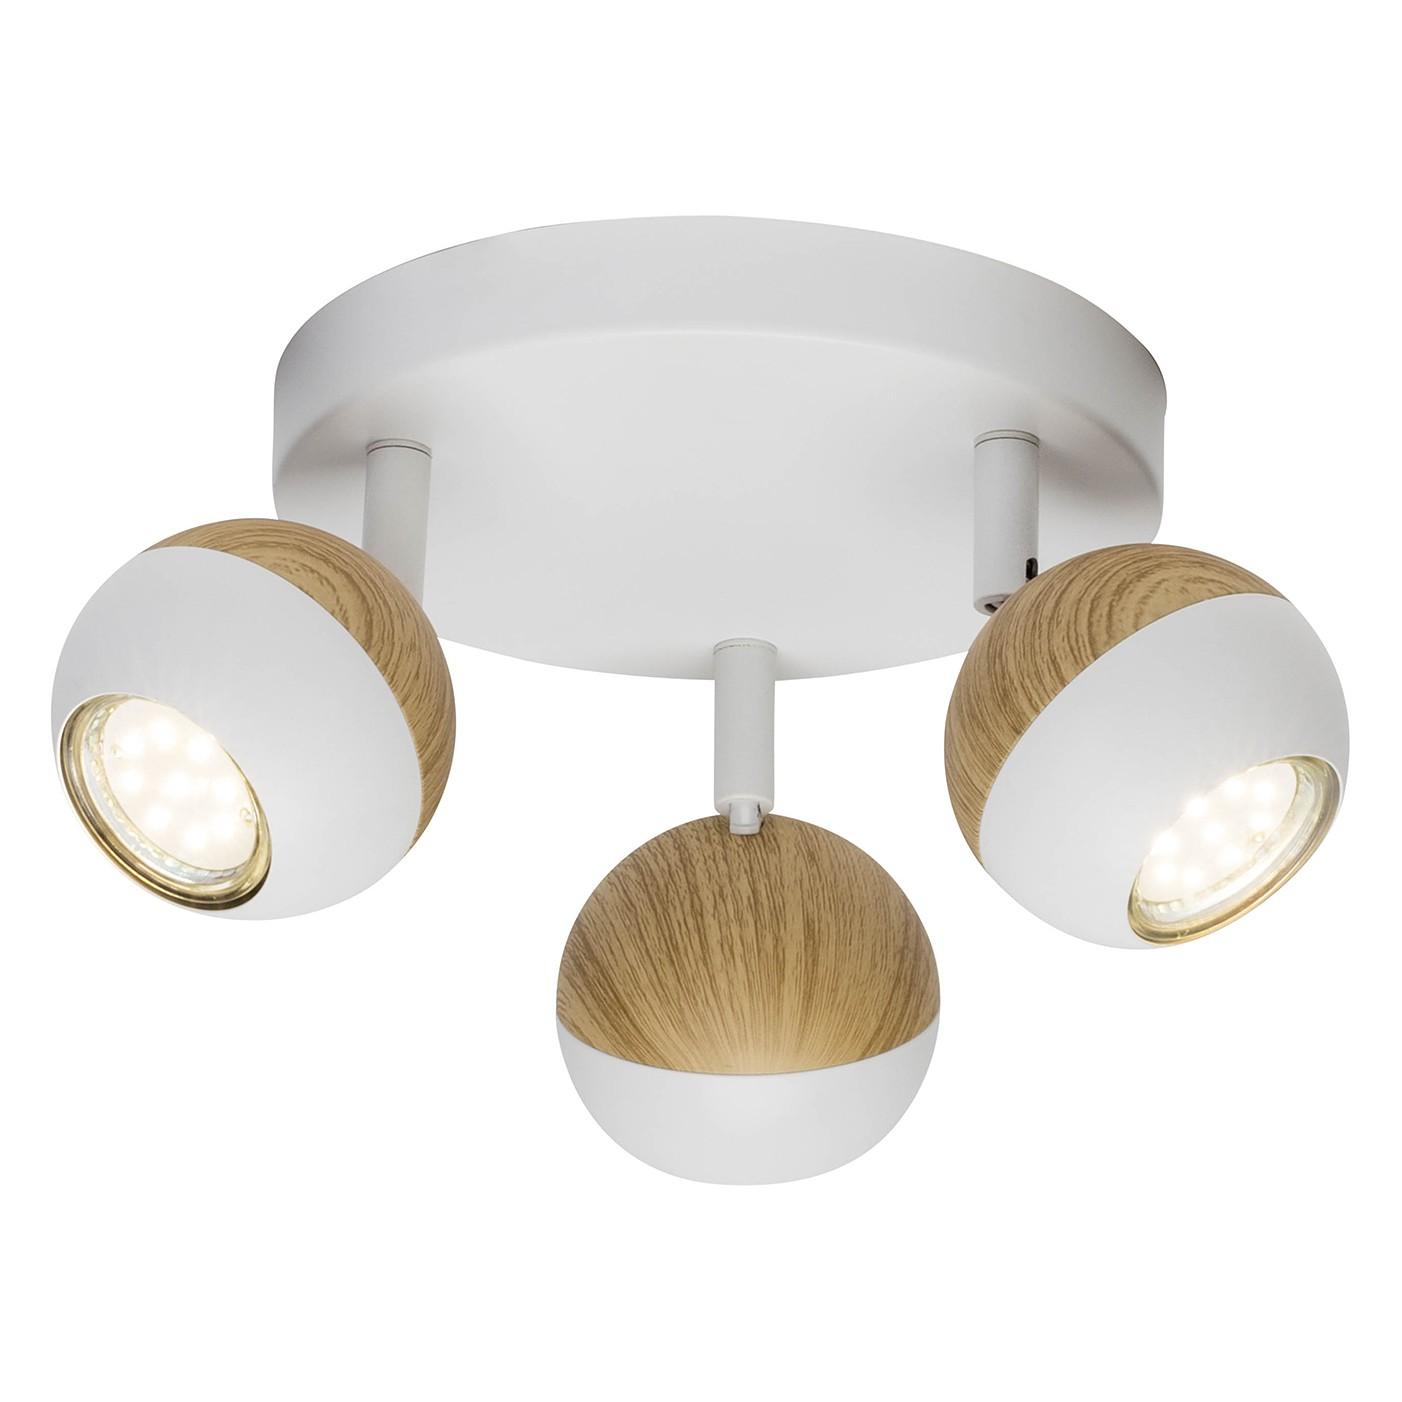 home24 LED-Deckenstrahler Scan II